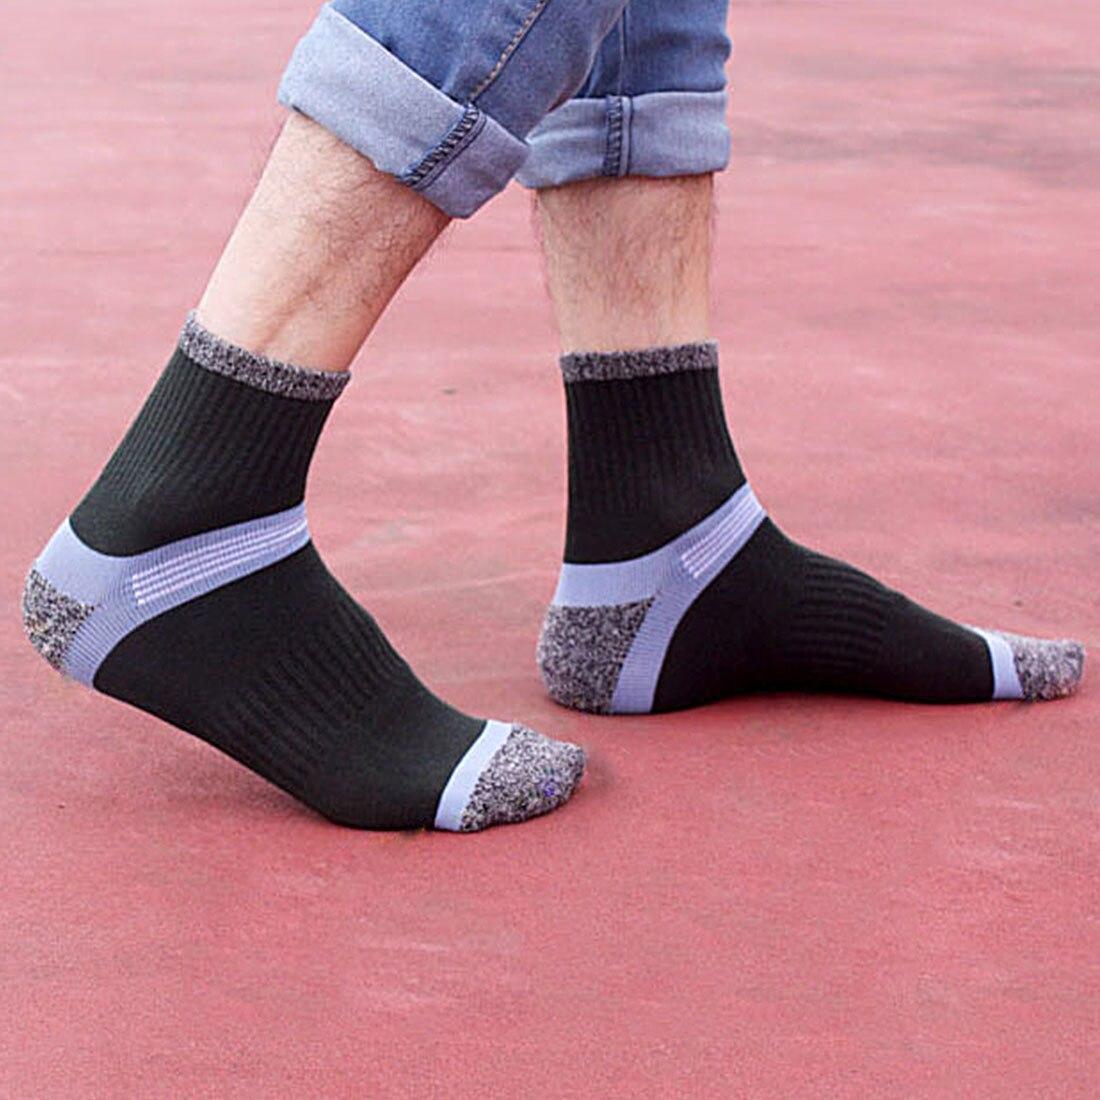 Charming 3 Pairs/Lot Cotton Socks Compression Breathable Socks Boy Contrast Color Standard Meias Good Quality Sheer Socks